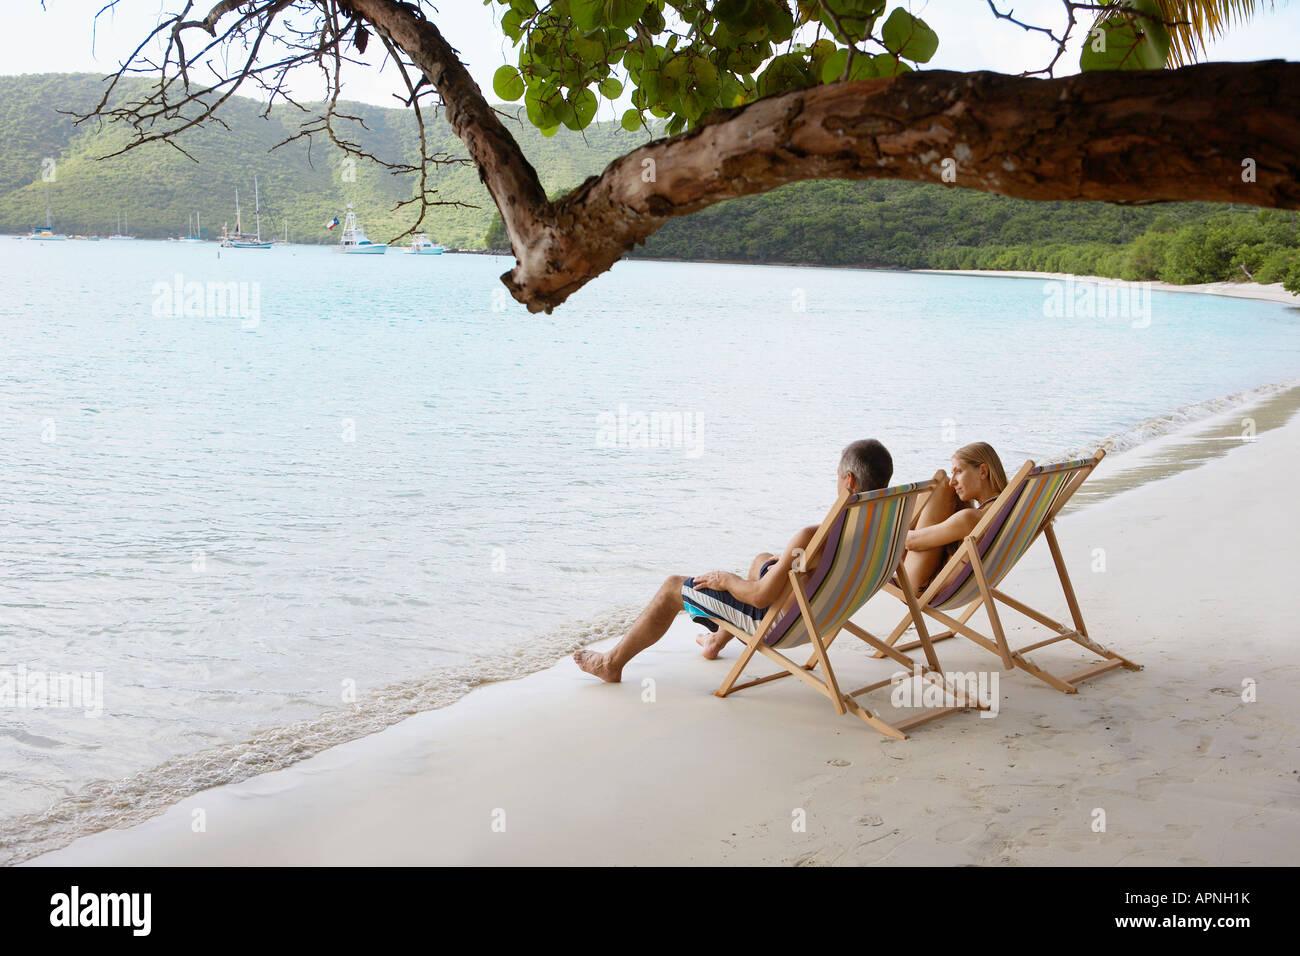 Mid adult couple on lounge chairs on beach (high angle view), St. John, US Virgin Islands, USA Stock Photo